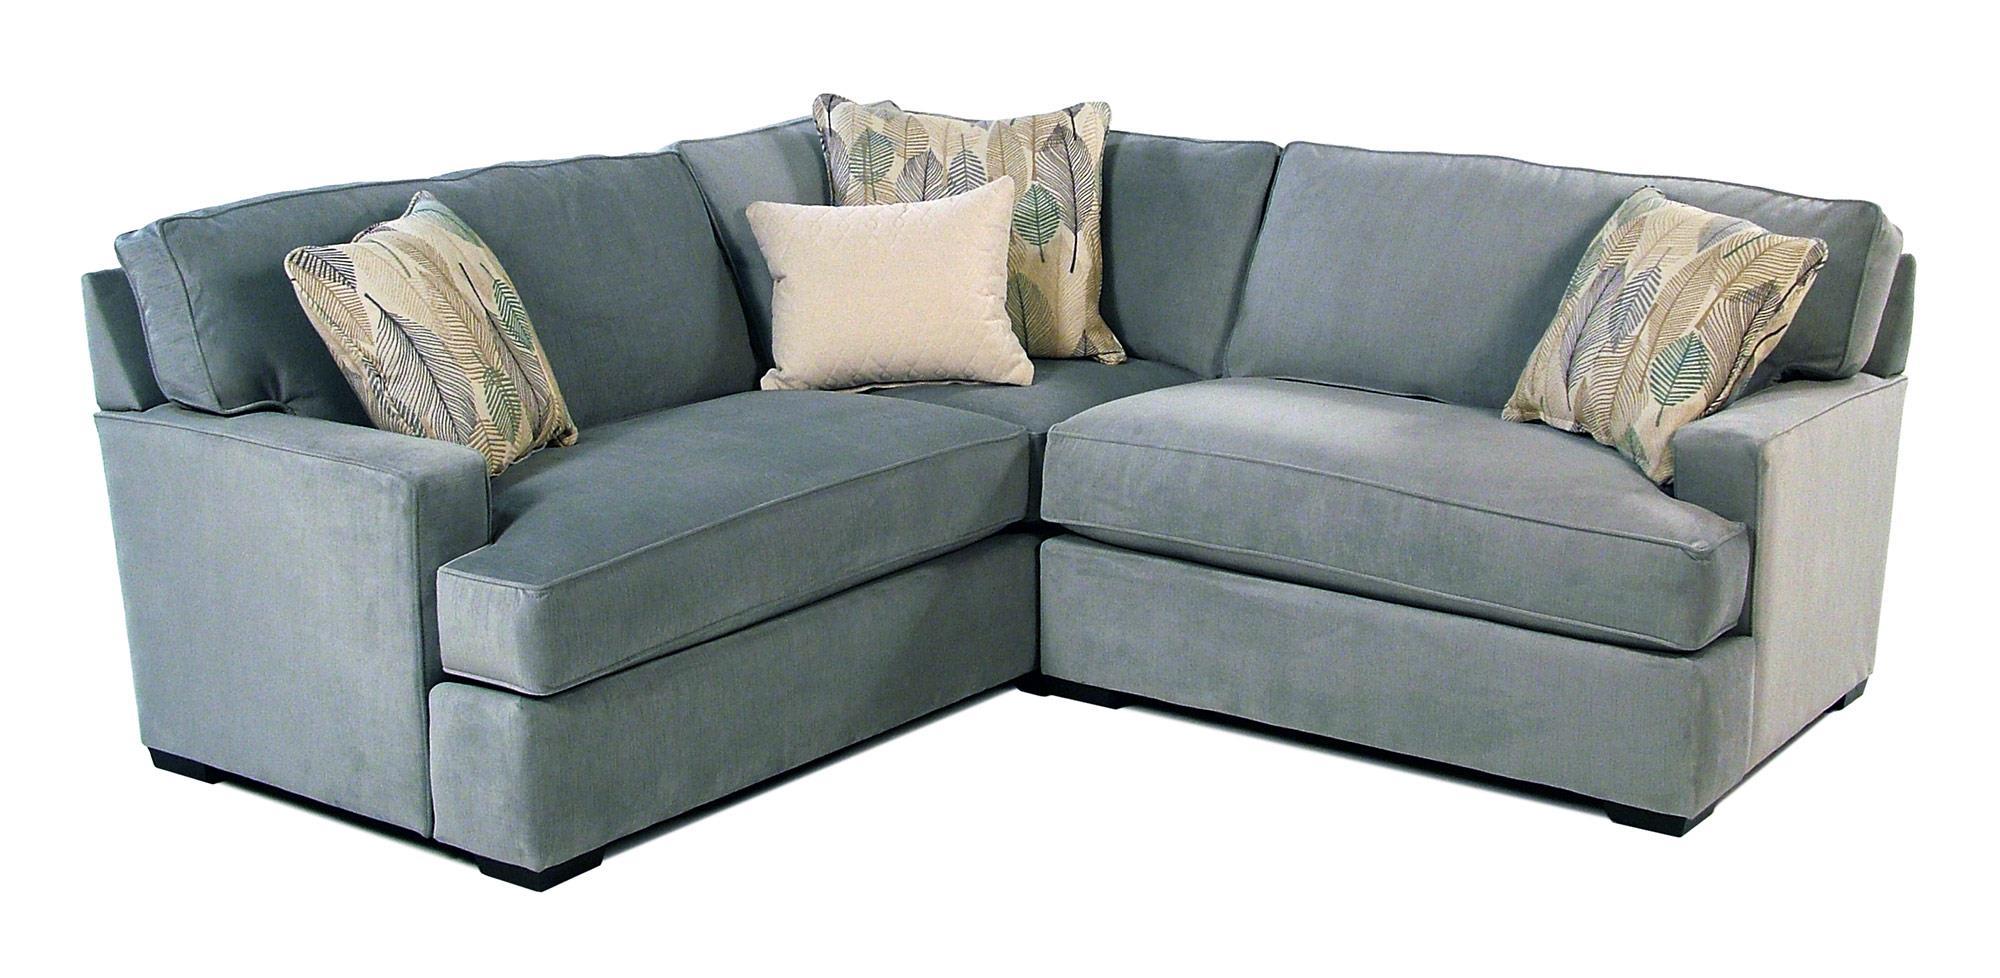 Sectional Sofas Under 800 Instasofa